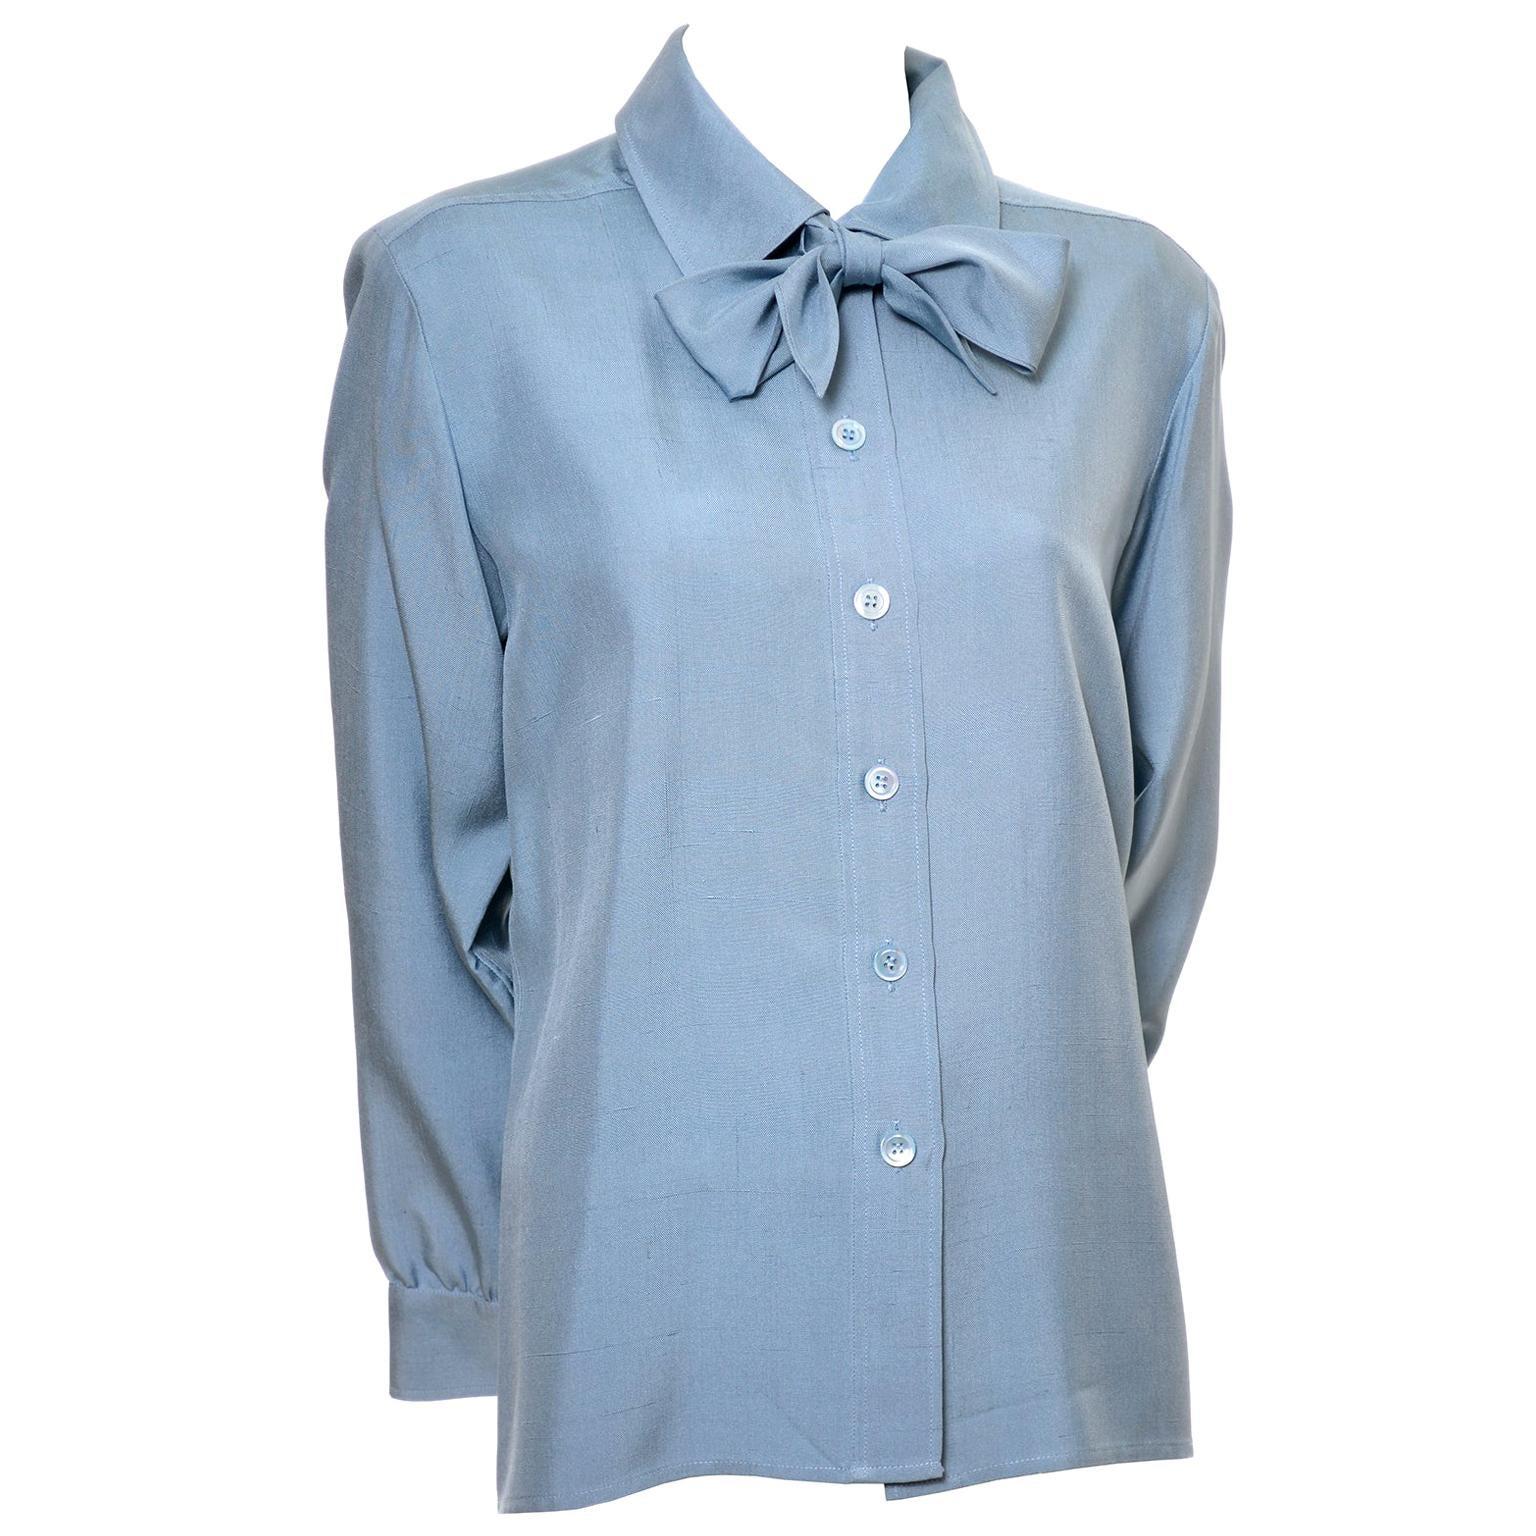 YSL Vintage Bow Blouse Blue Raw Silk Yves Saint Laurent France Size 38